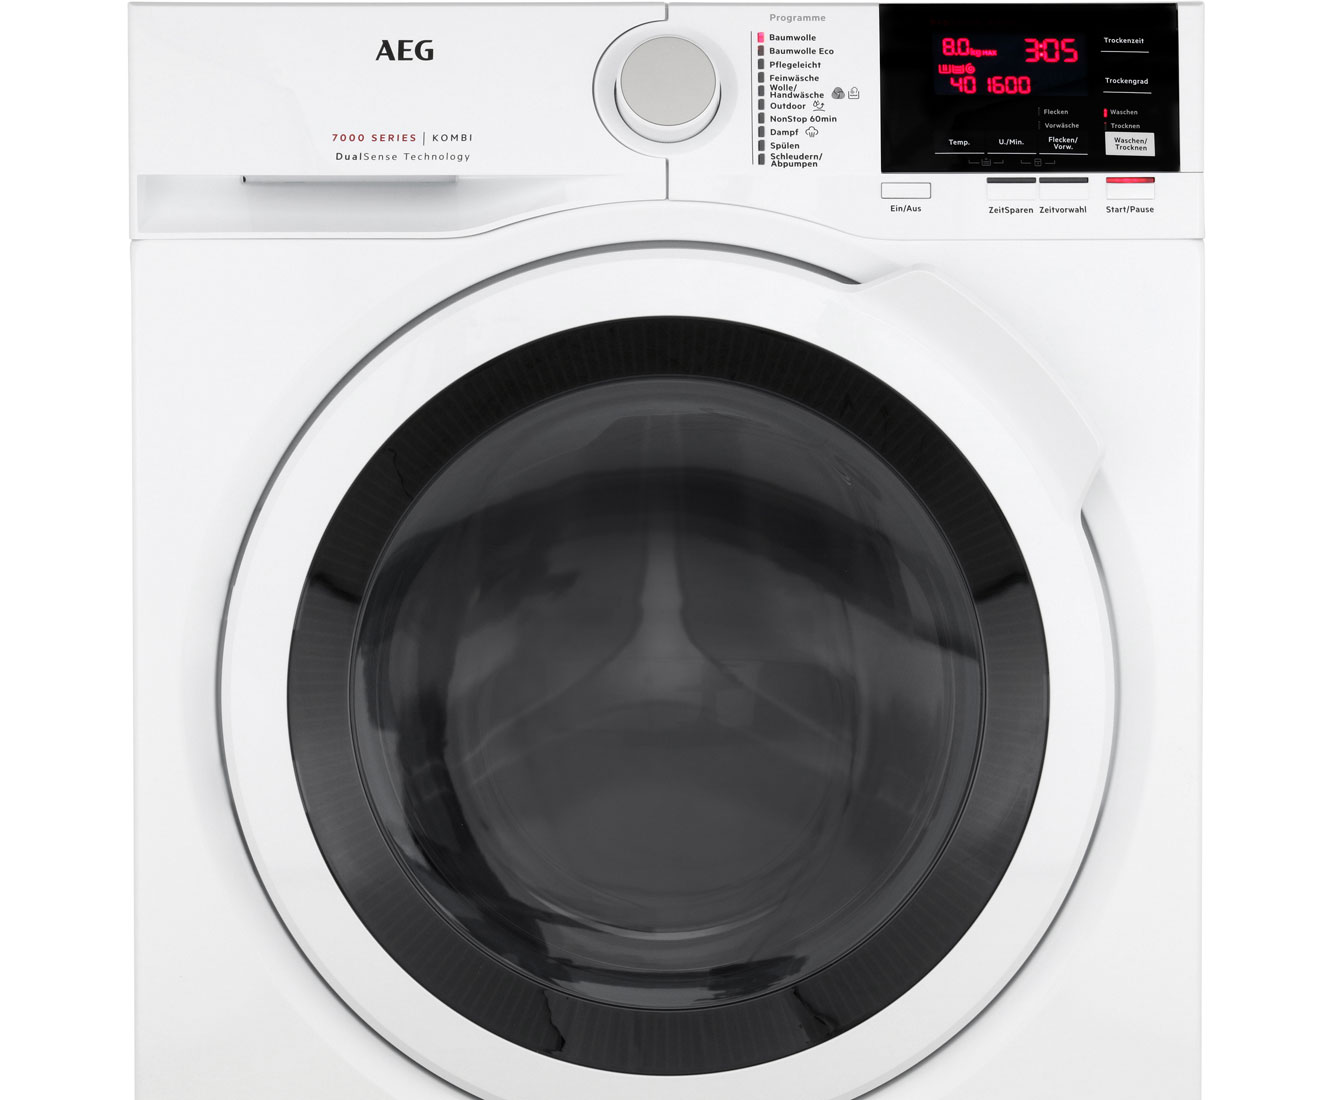 Aeg lavamat kombi l7wb65684 waschtrockner 8 kg waschen 4 kg